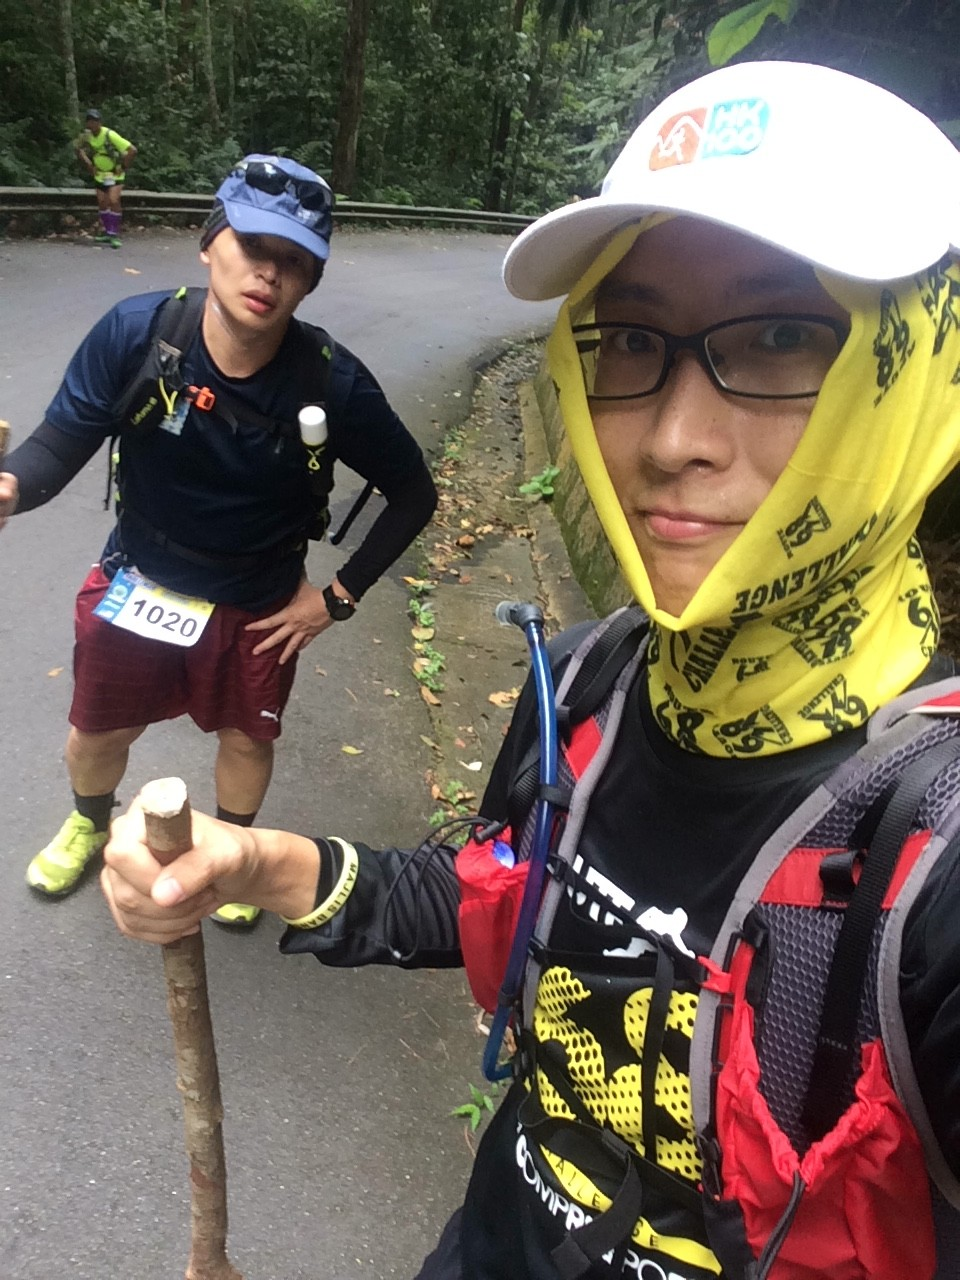 Penang Ultra 2015 - Struggling to climb up the gruelling Penang Hill